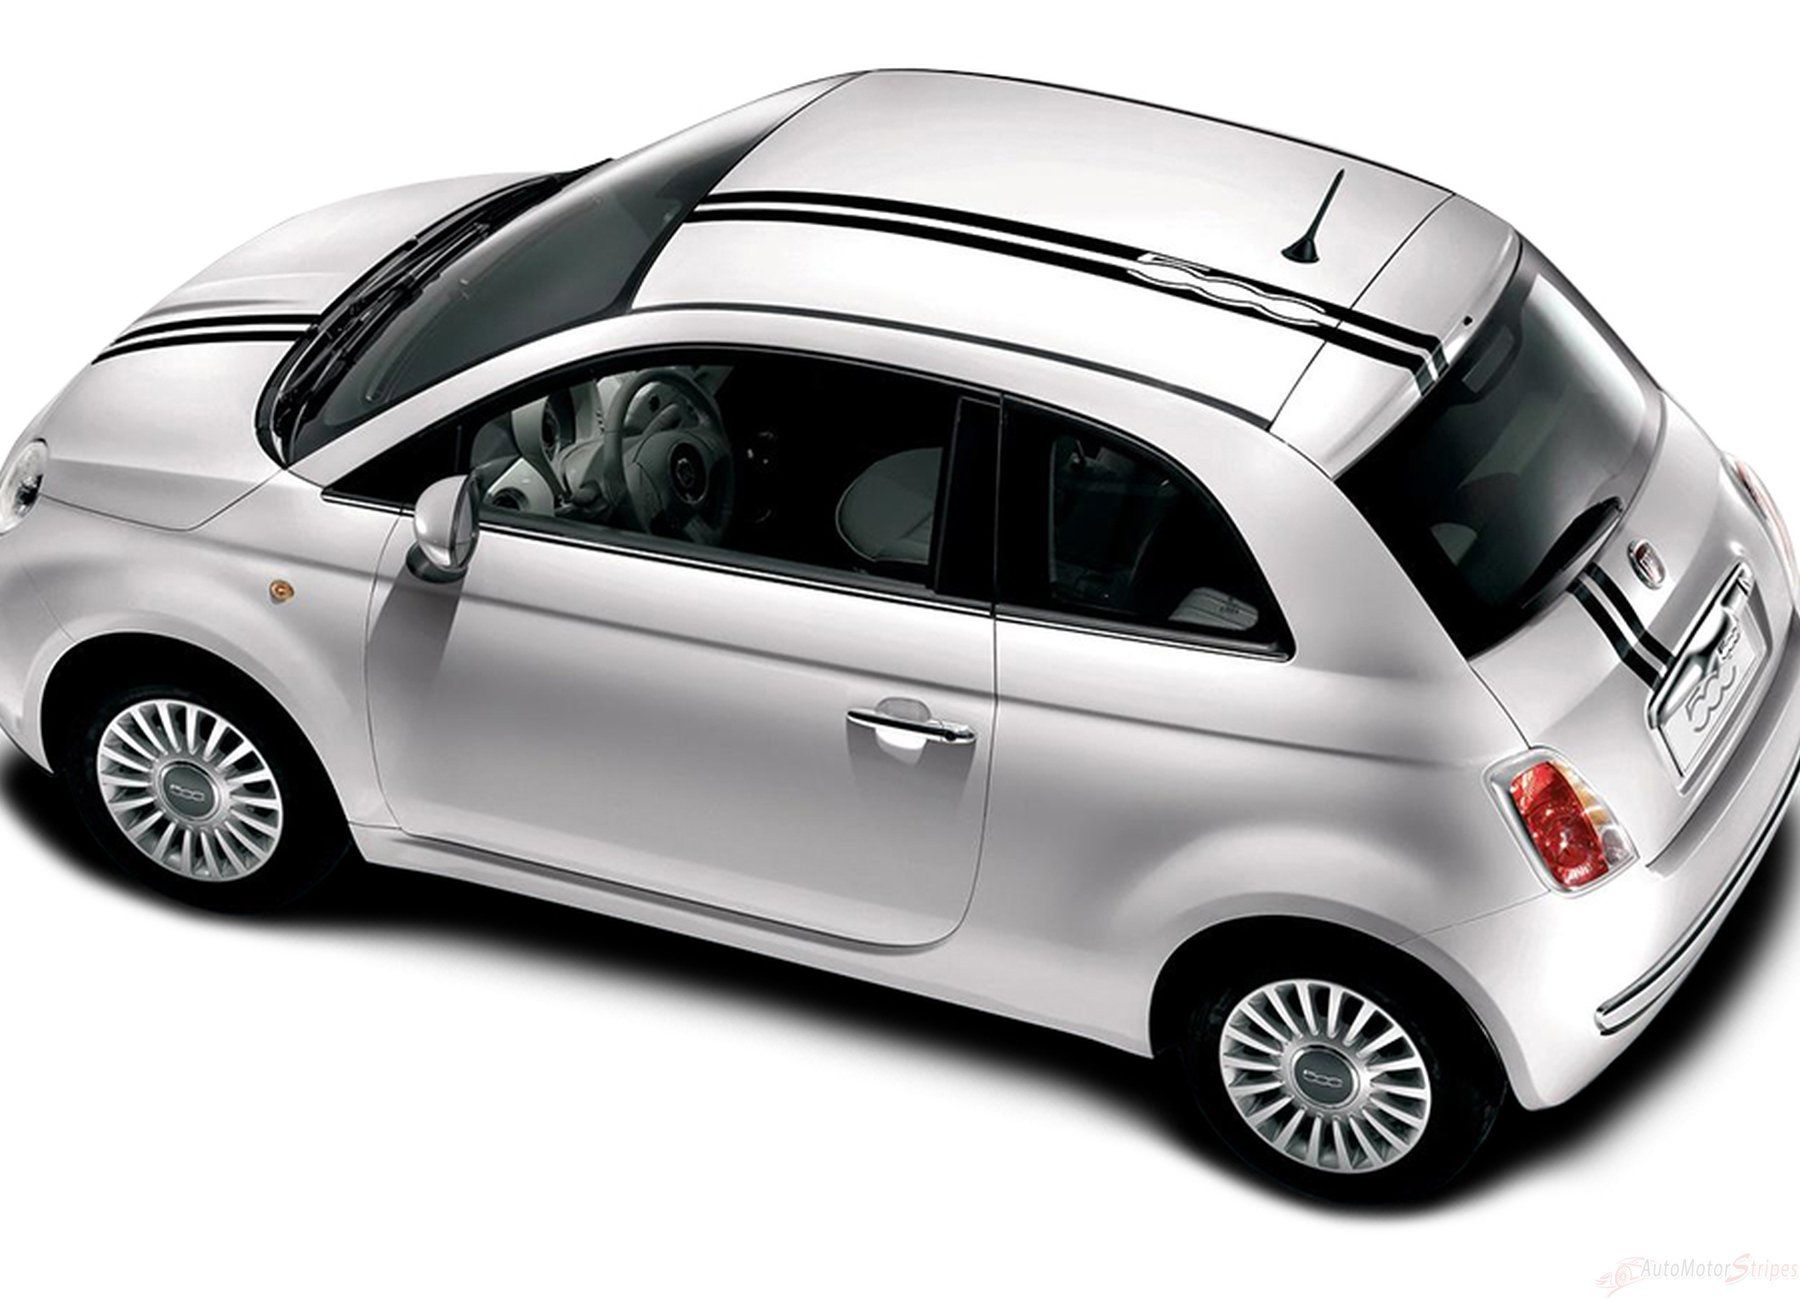 2007 2016 Fiat 500 Euro Rally Hood Roof Trunk Racing Stripes Vinyl